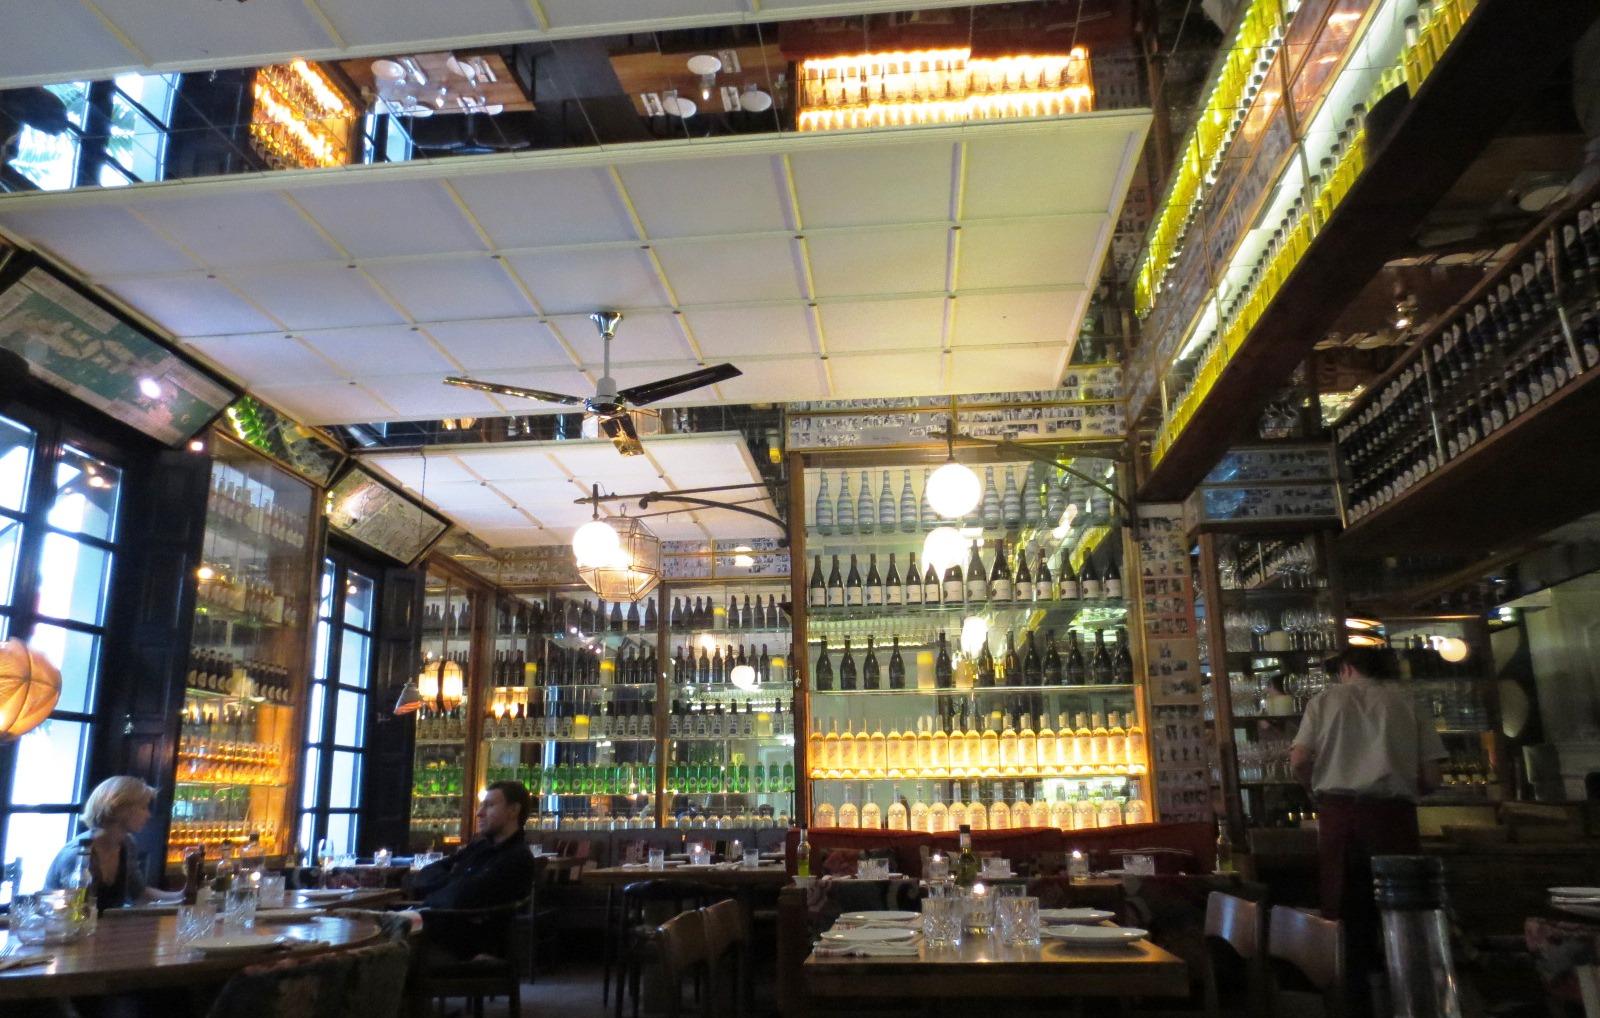 Boca-Grande-restaurang-Barcelona-travelgrip- (5)